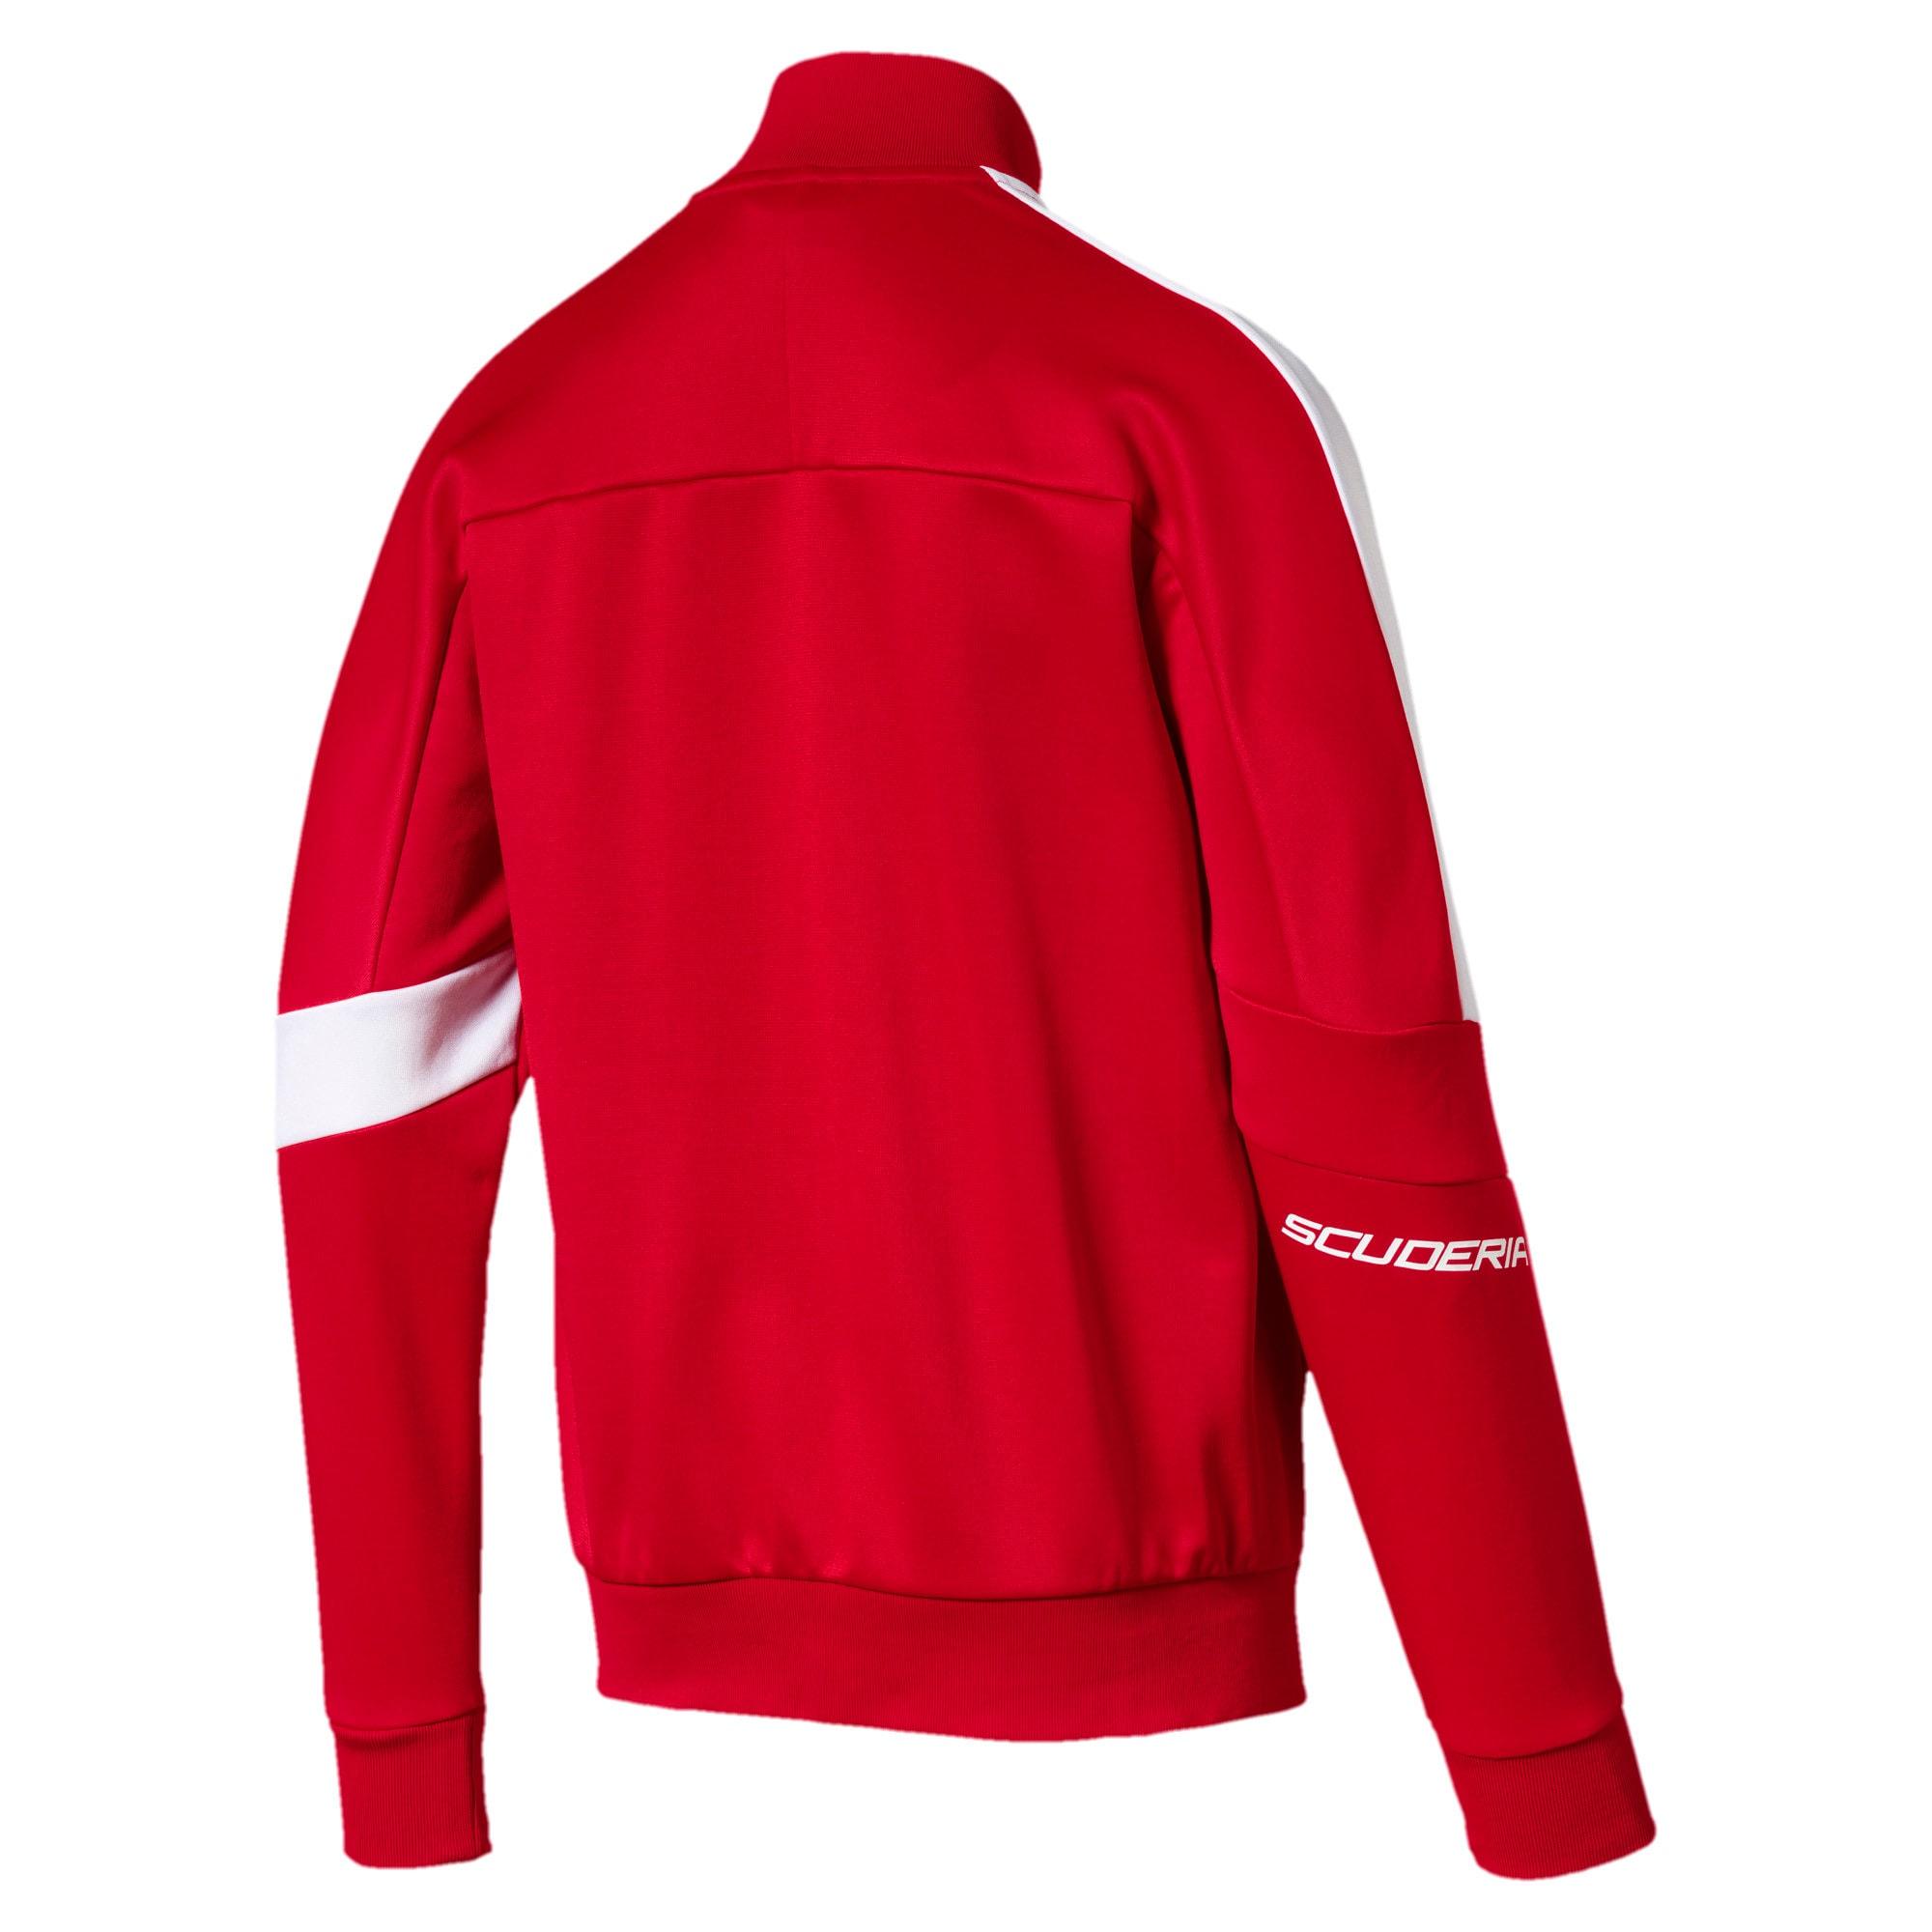 Thumbnail 5 of Ferrari T7 Men's Track Jacket, Rosso Corsa, medium